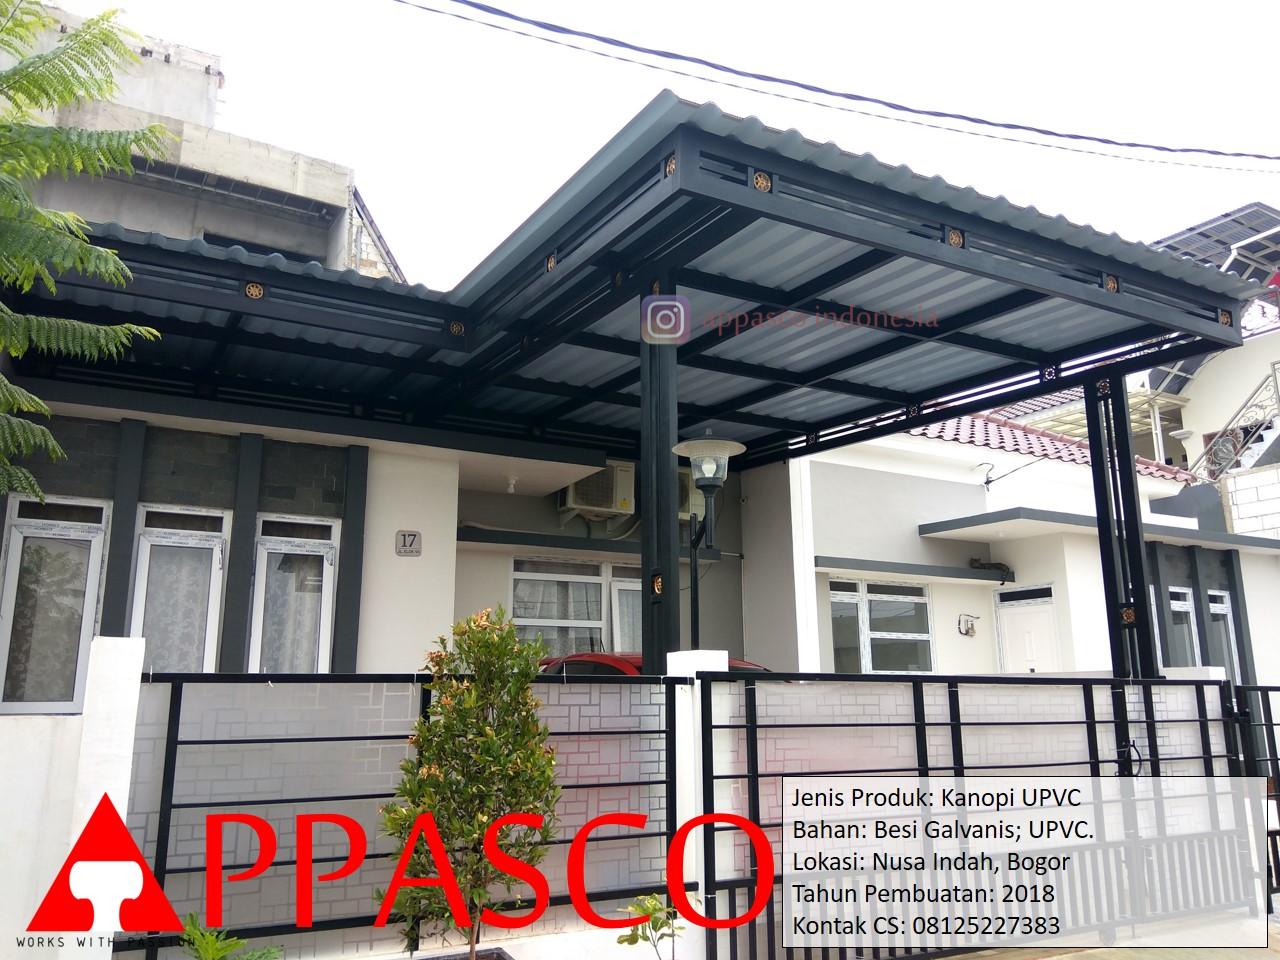 Kanopi UPVC Besi Galvanis di Nusa Indah Bogor